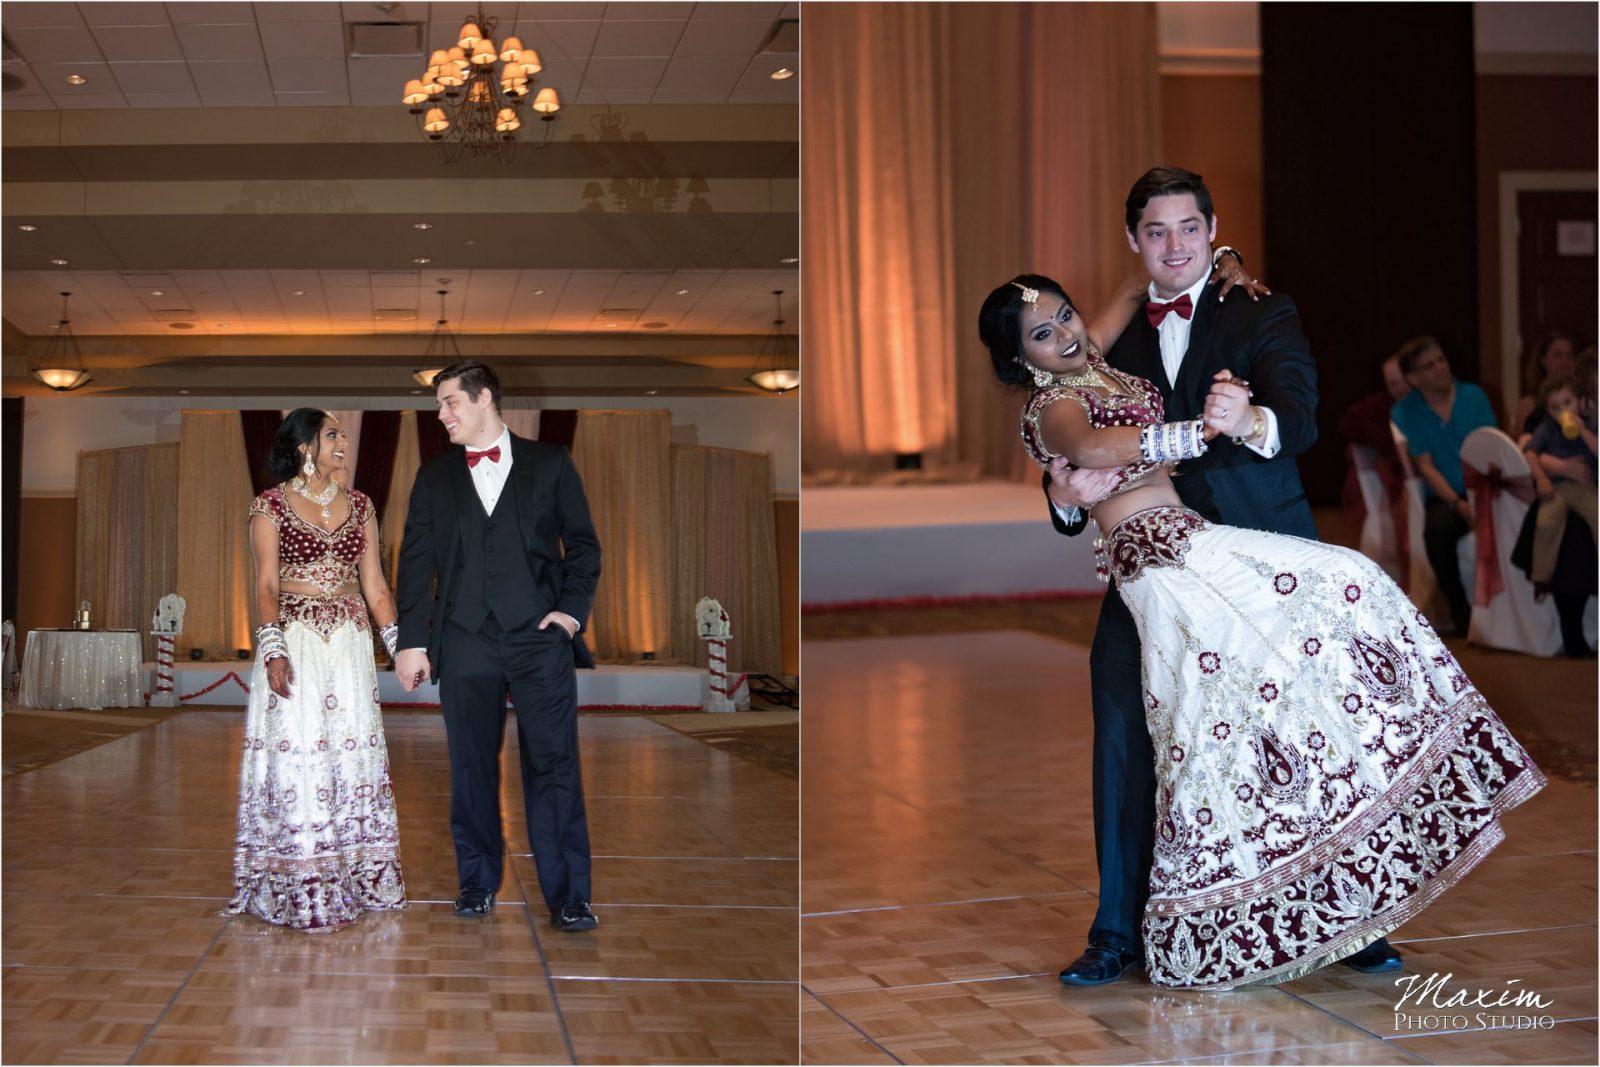 Savannah Center Cincinnati Indian Wedding Reception dance